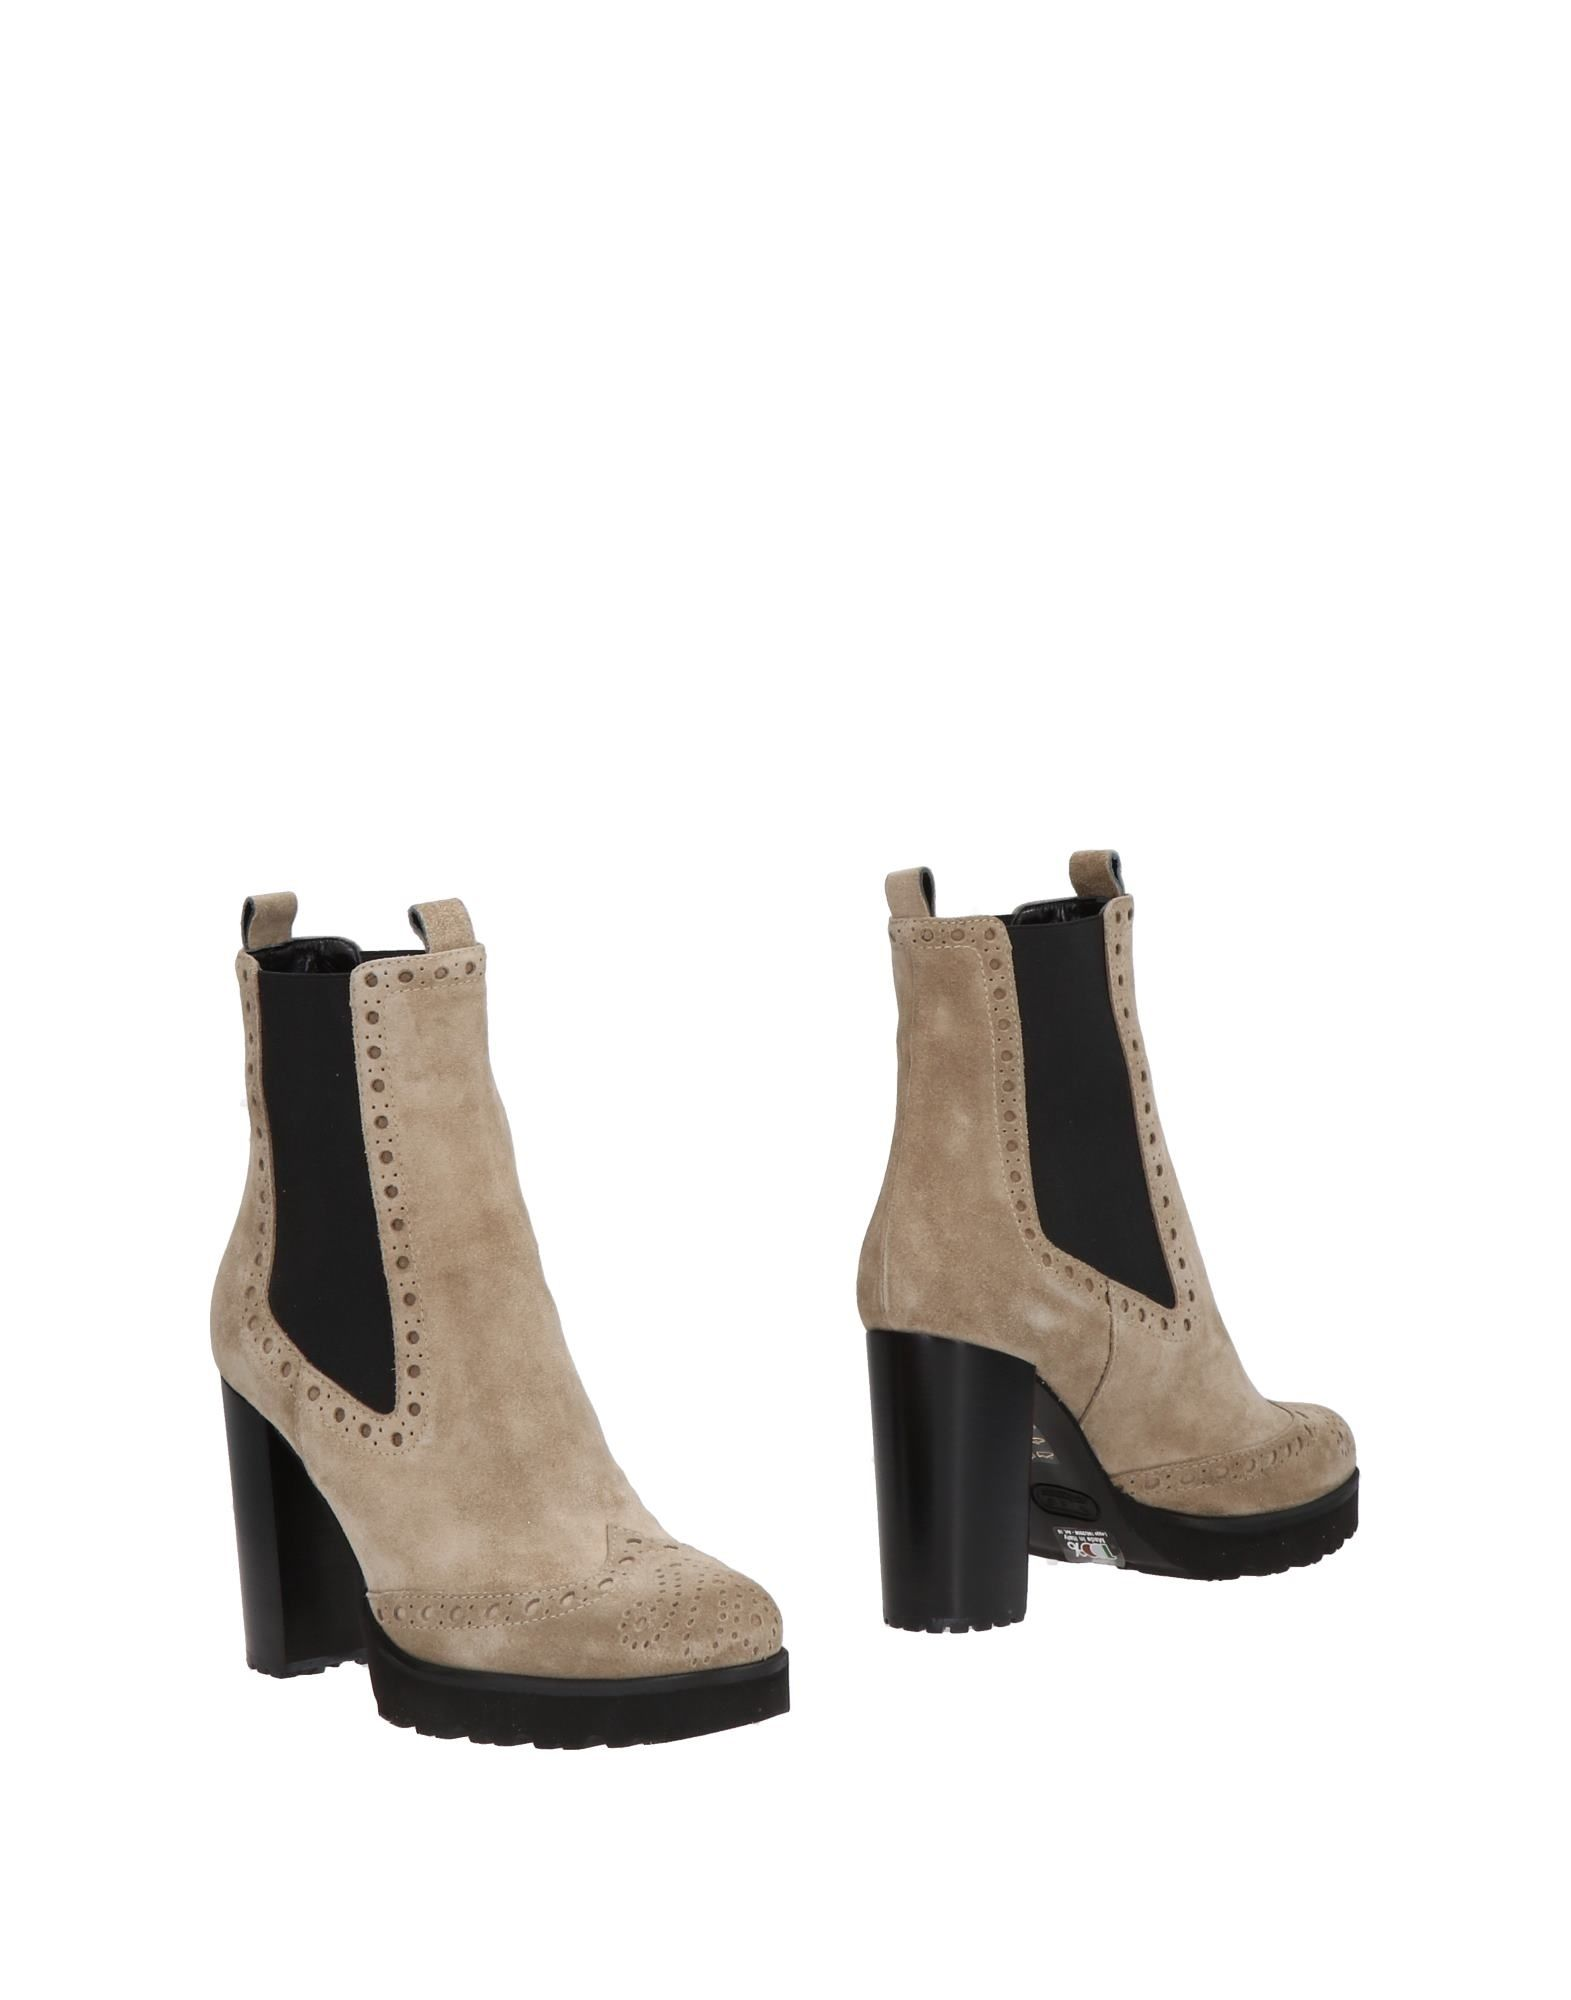 Maria Cristina Chelsea Boots Damen  11501323QXGut aussehende strapazierfähige Schuhe